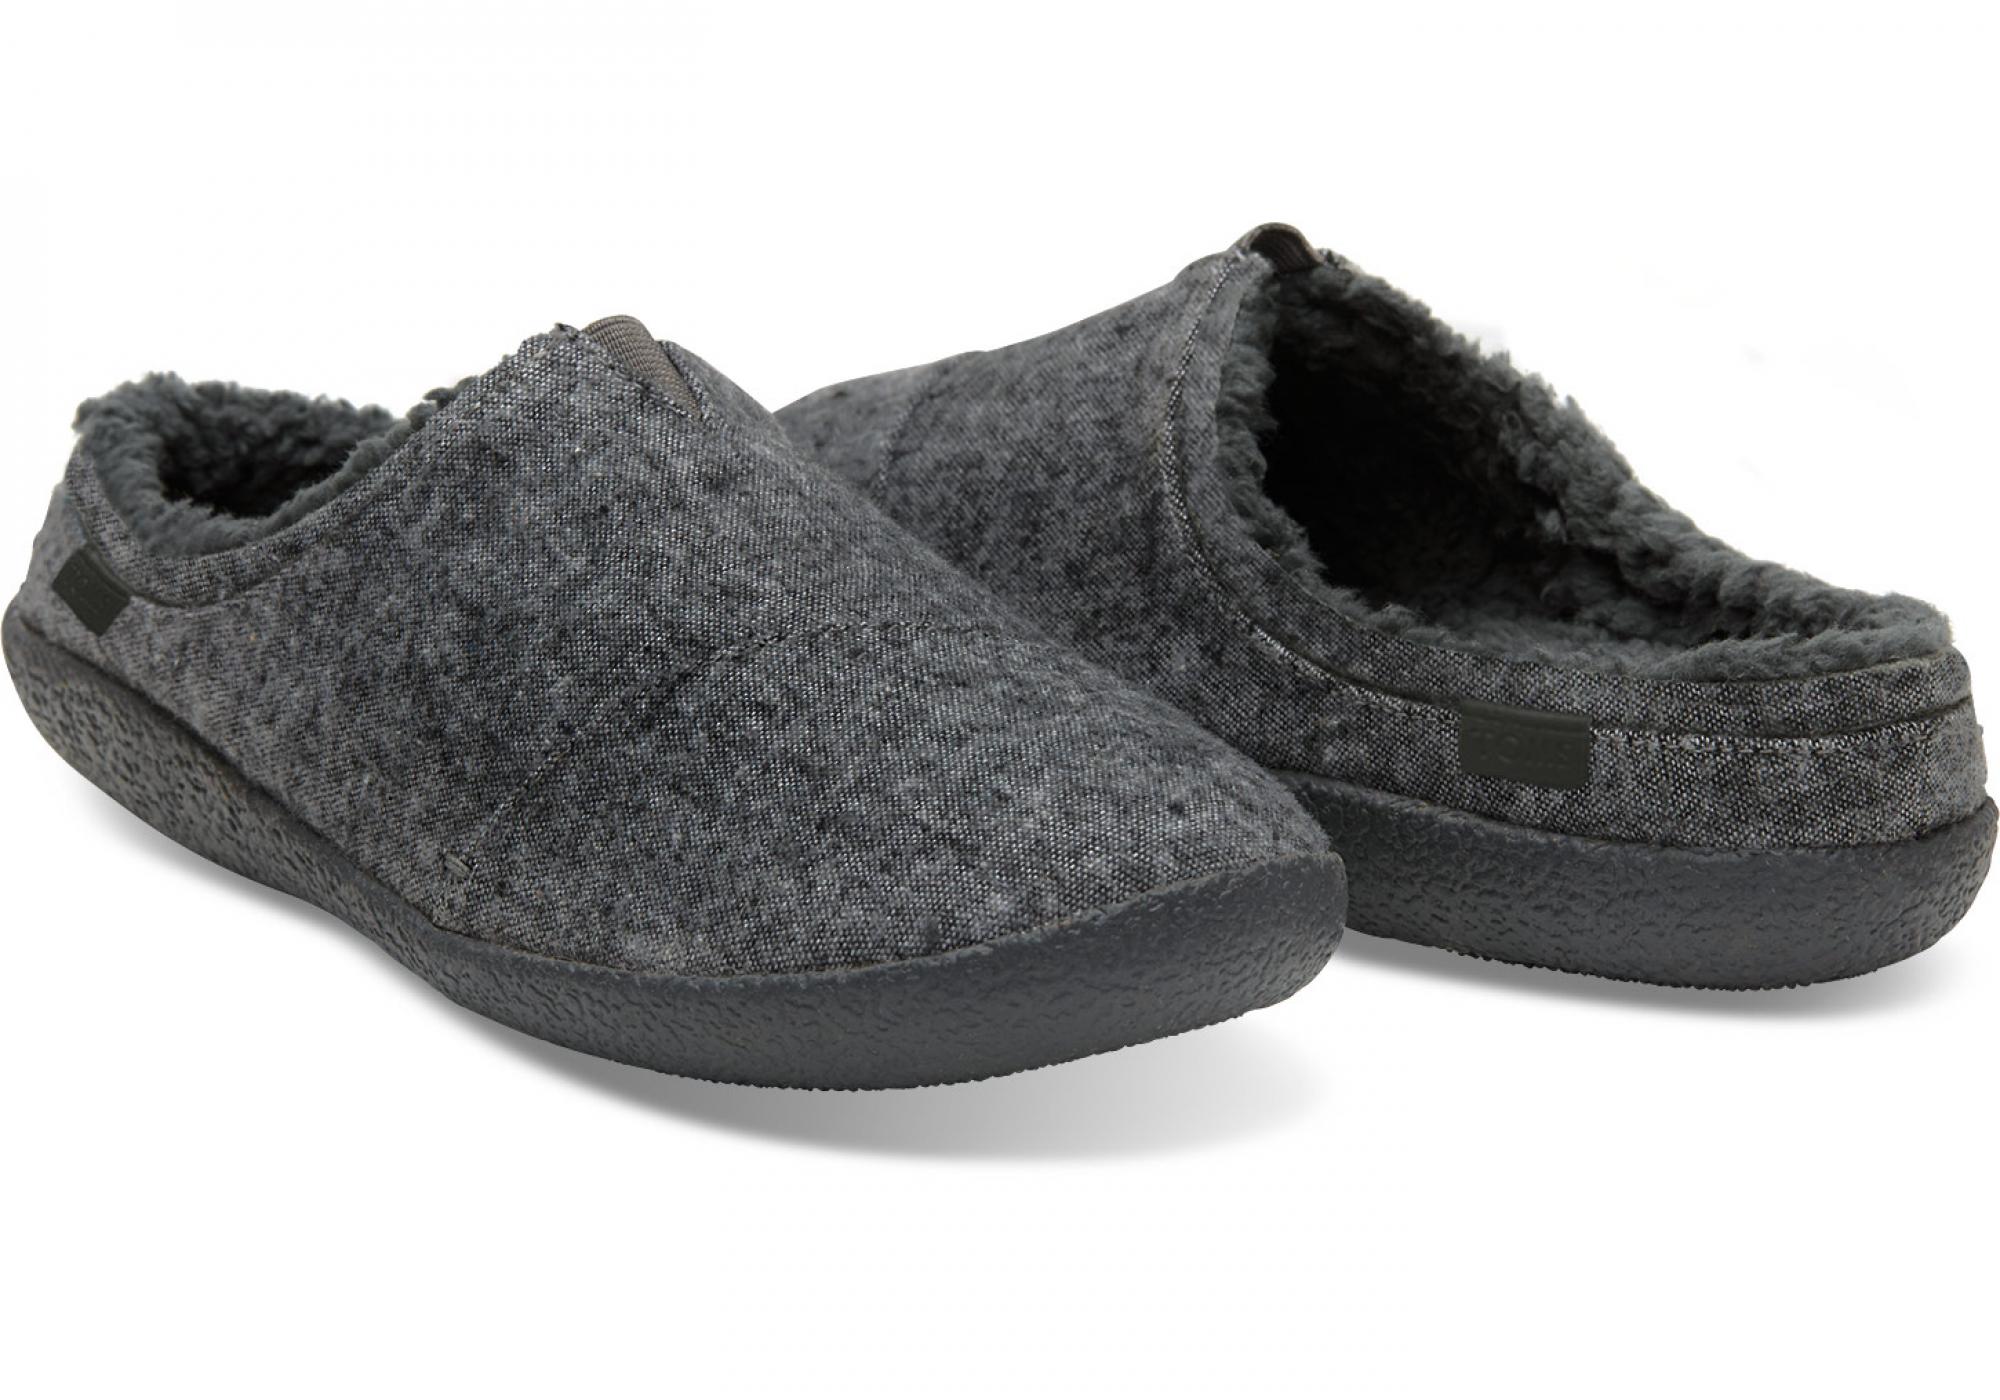 707415ad4033 Pánske sivé papuče TOMS Textile Berkeley